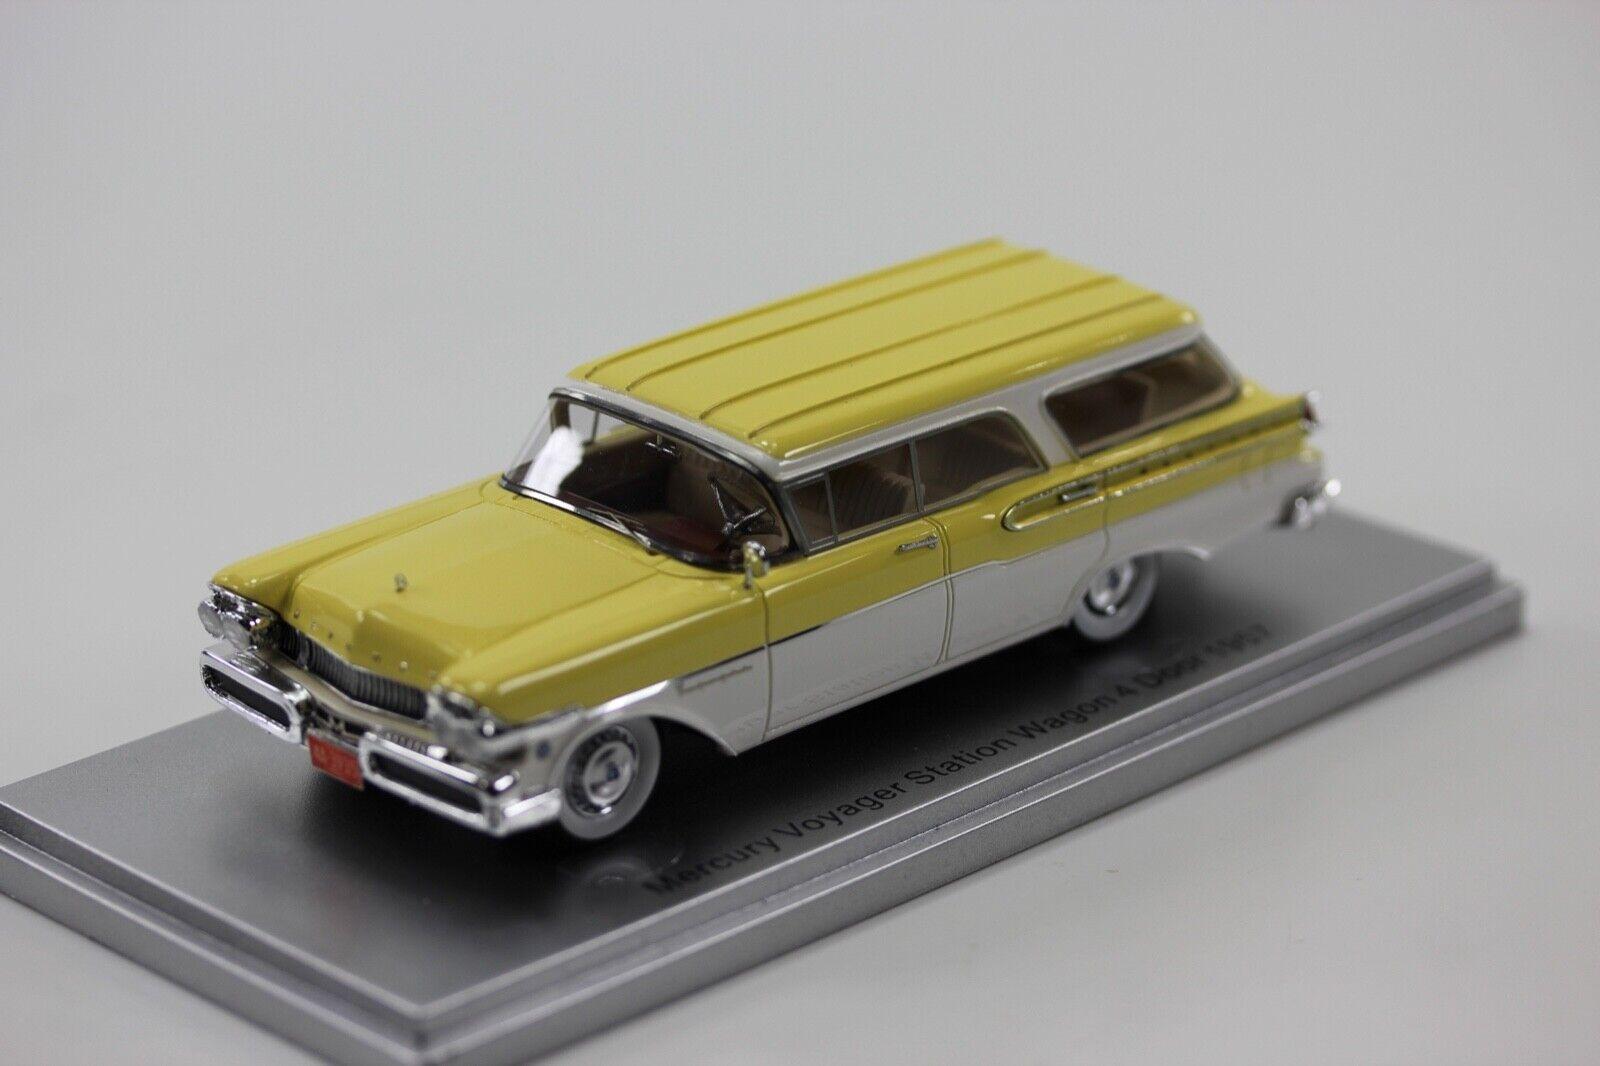 Kess Mercury Voyager Station Wagon 1957 Ford 1 43 Kess 43021020